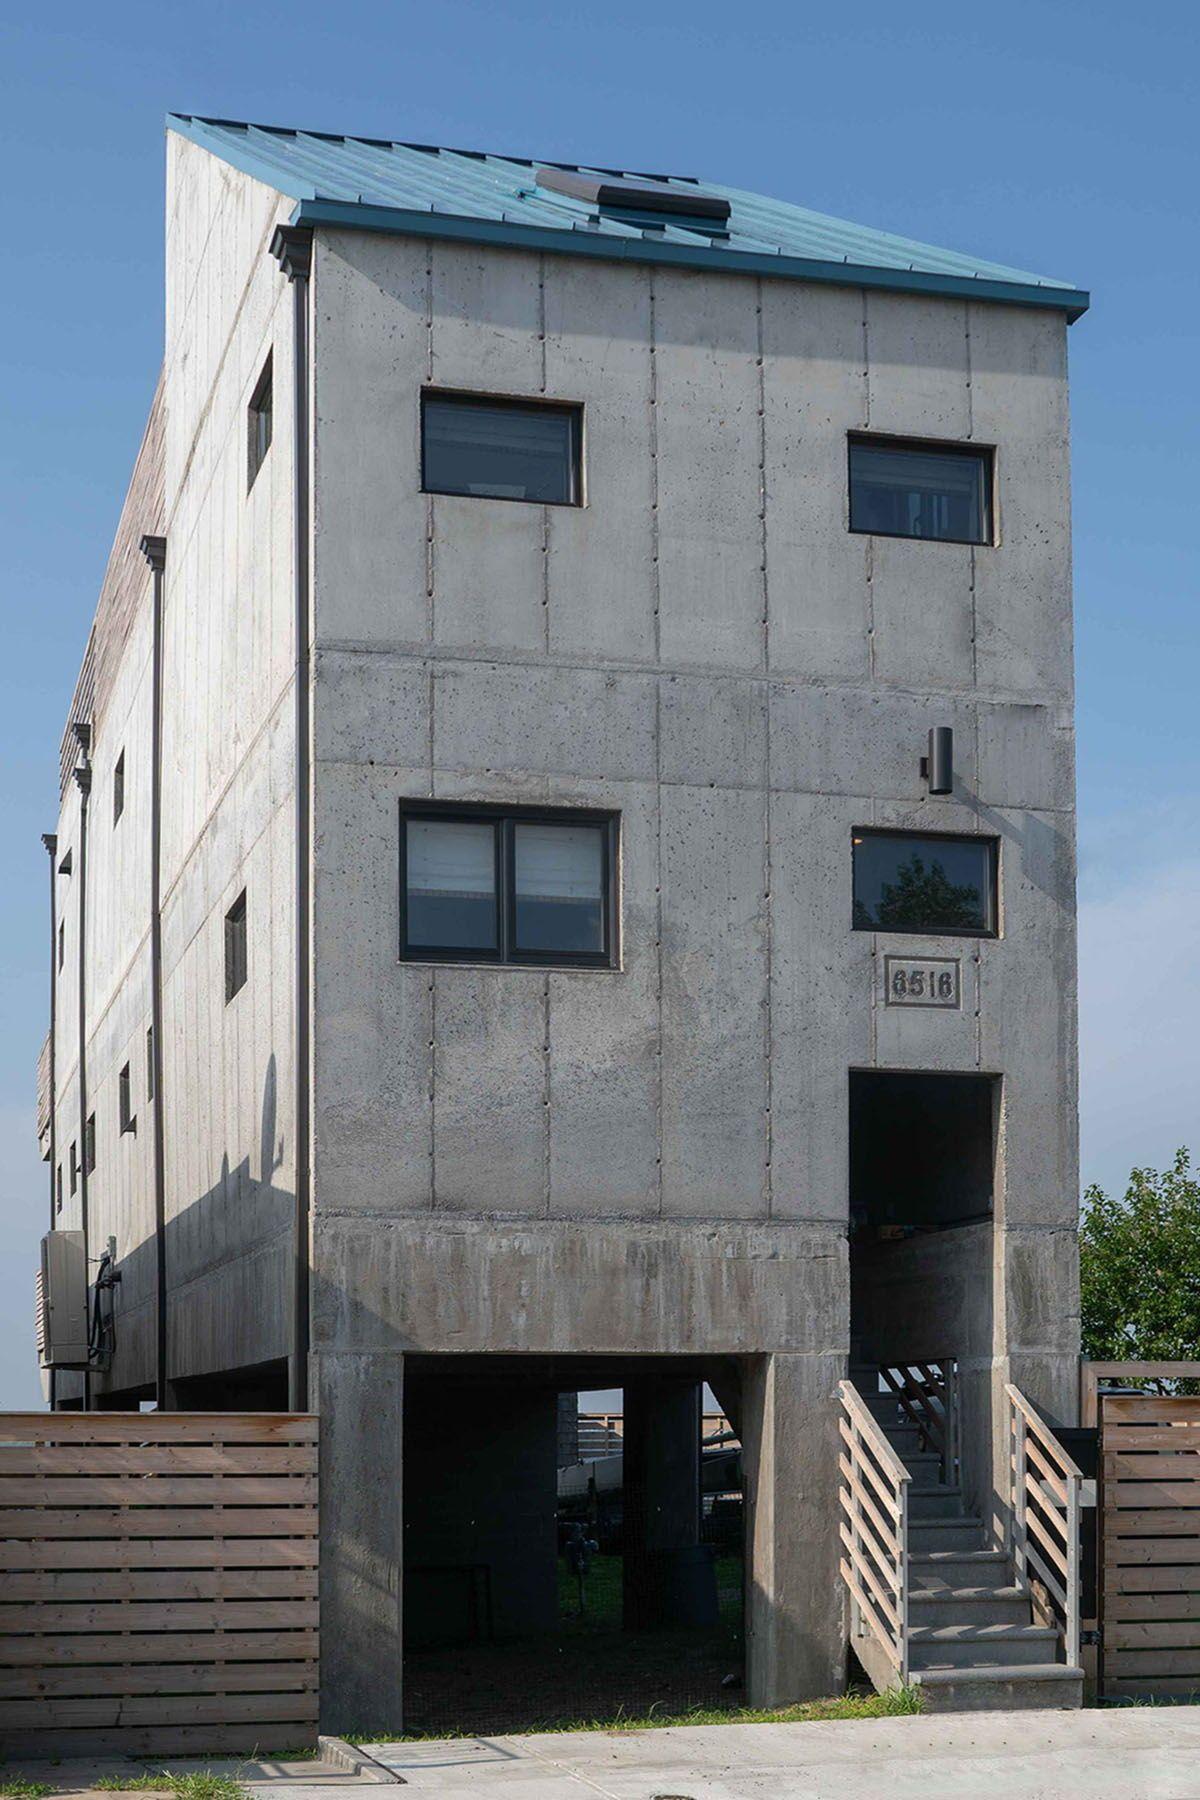 Modern Concrete House Exterior Design In 2020 Concrete House Concrete Architecture Exterior Design